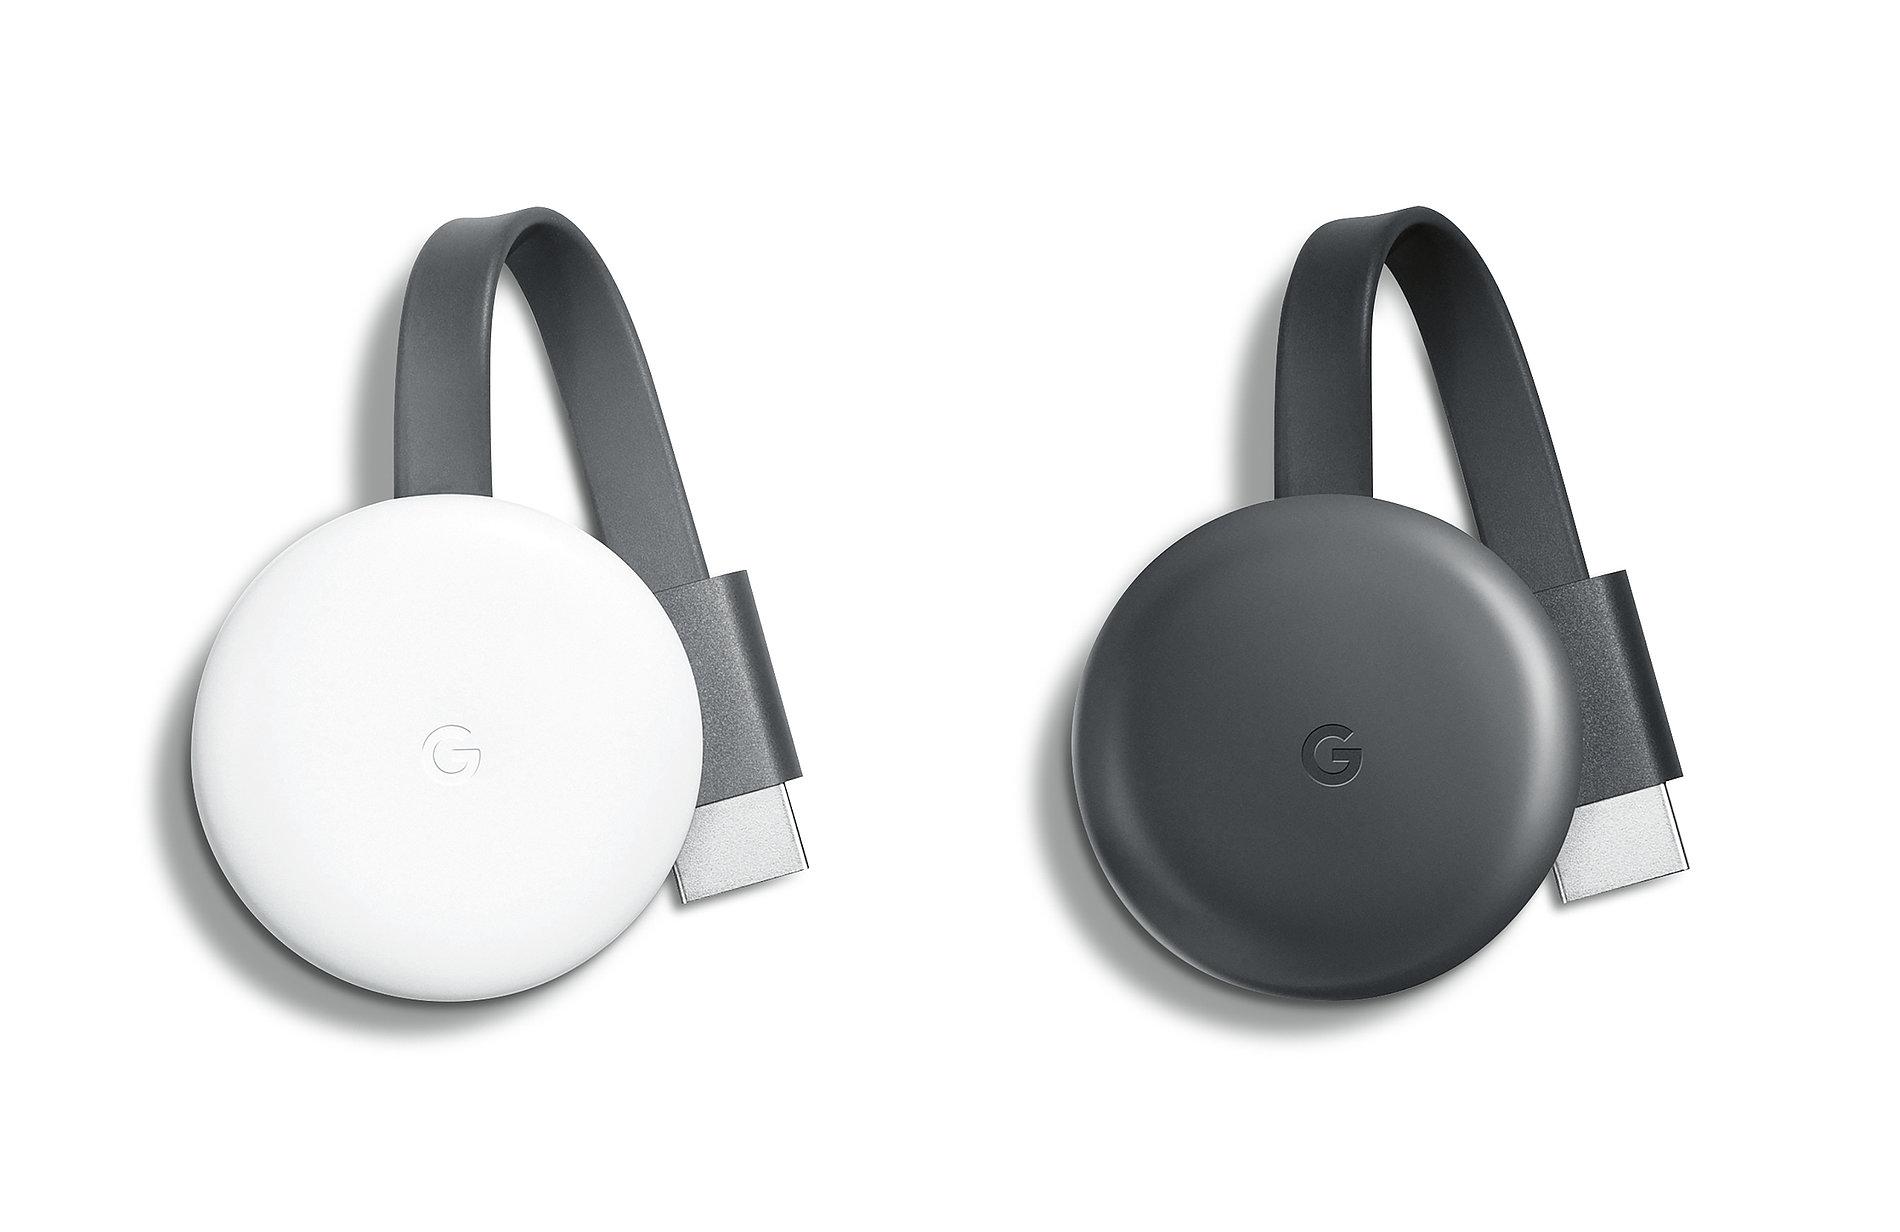 Google Chromecast   Red Dot Design Award